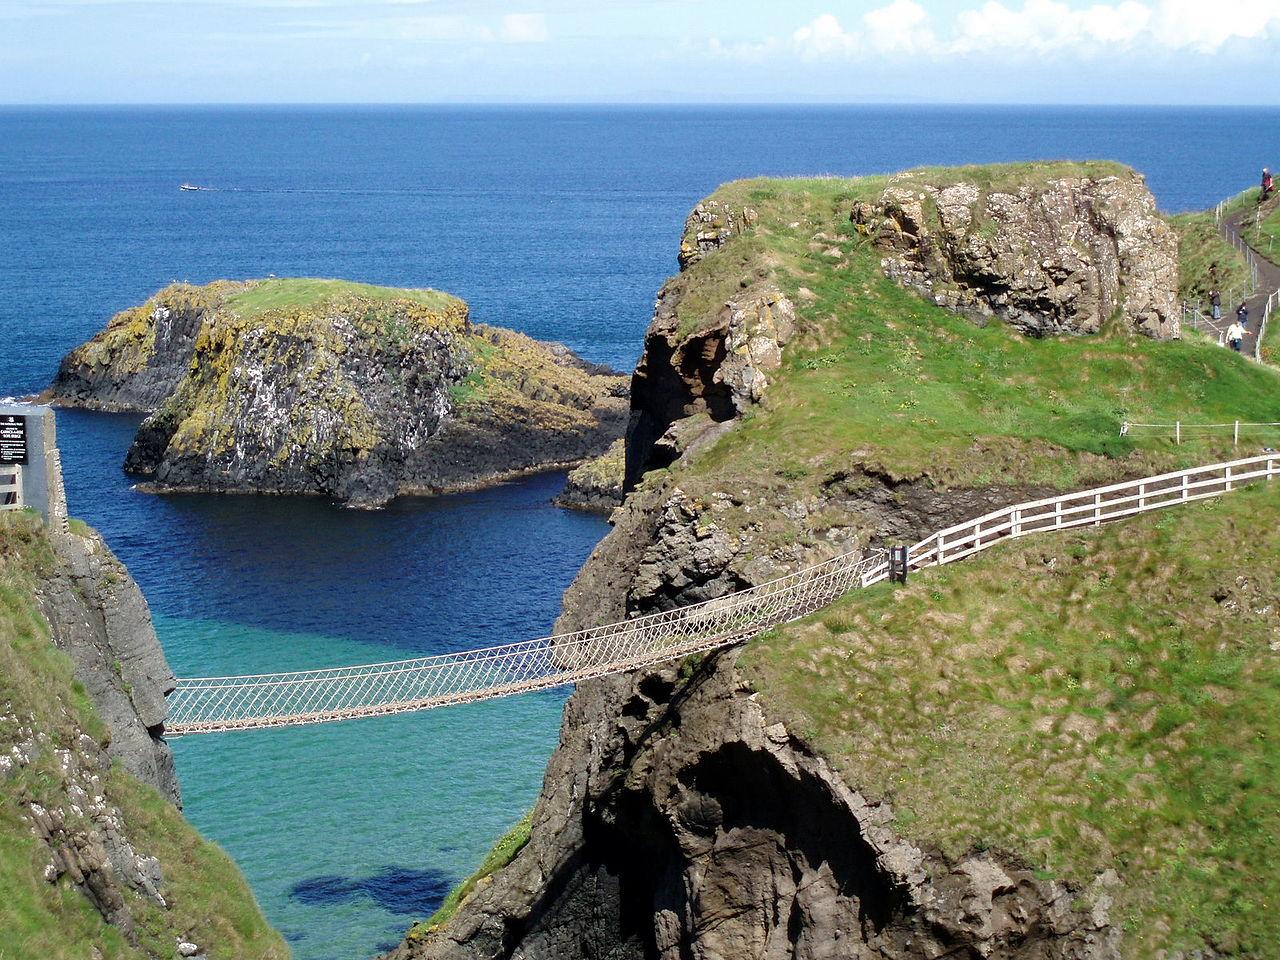 Luxury guided Tours of Ireland Ireland Golf Trips